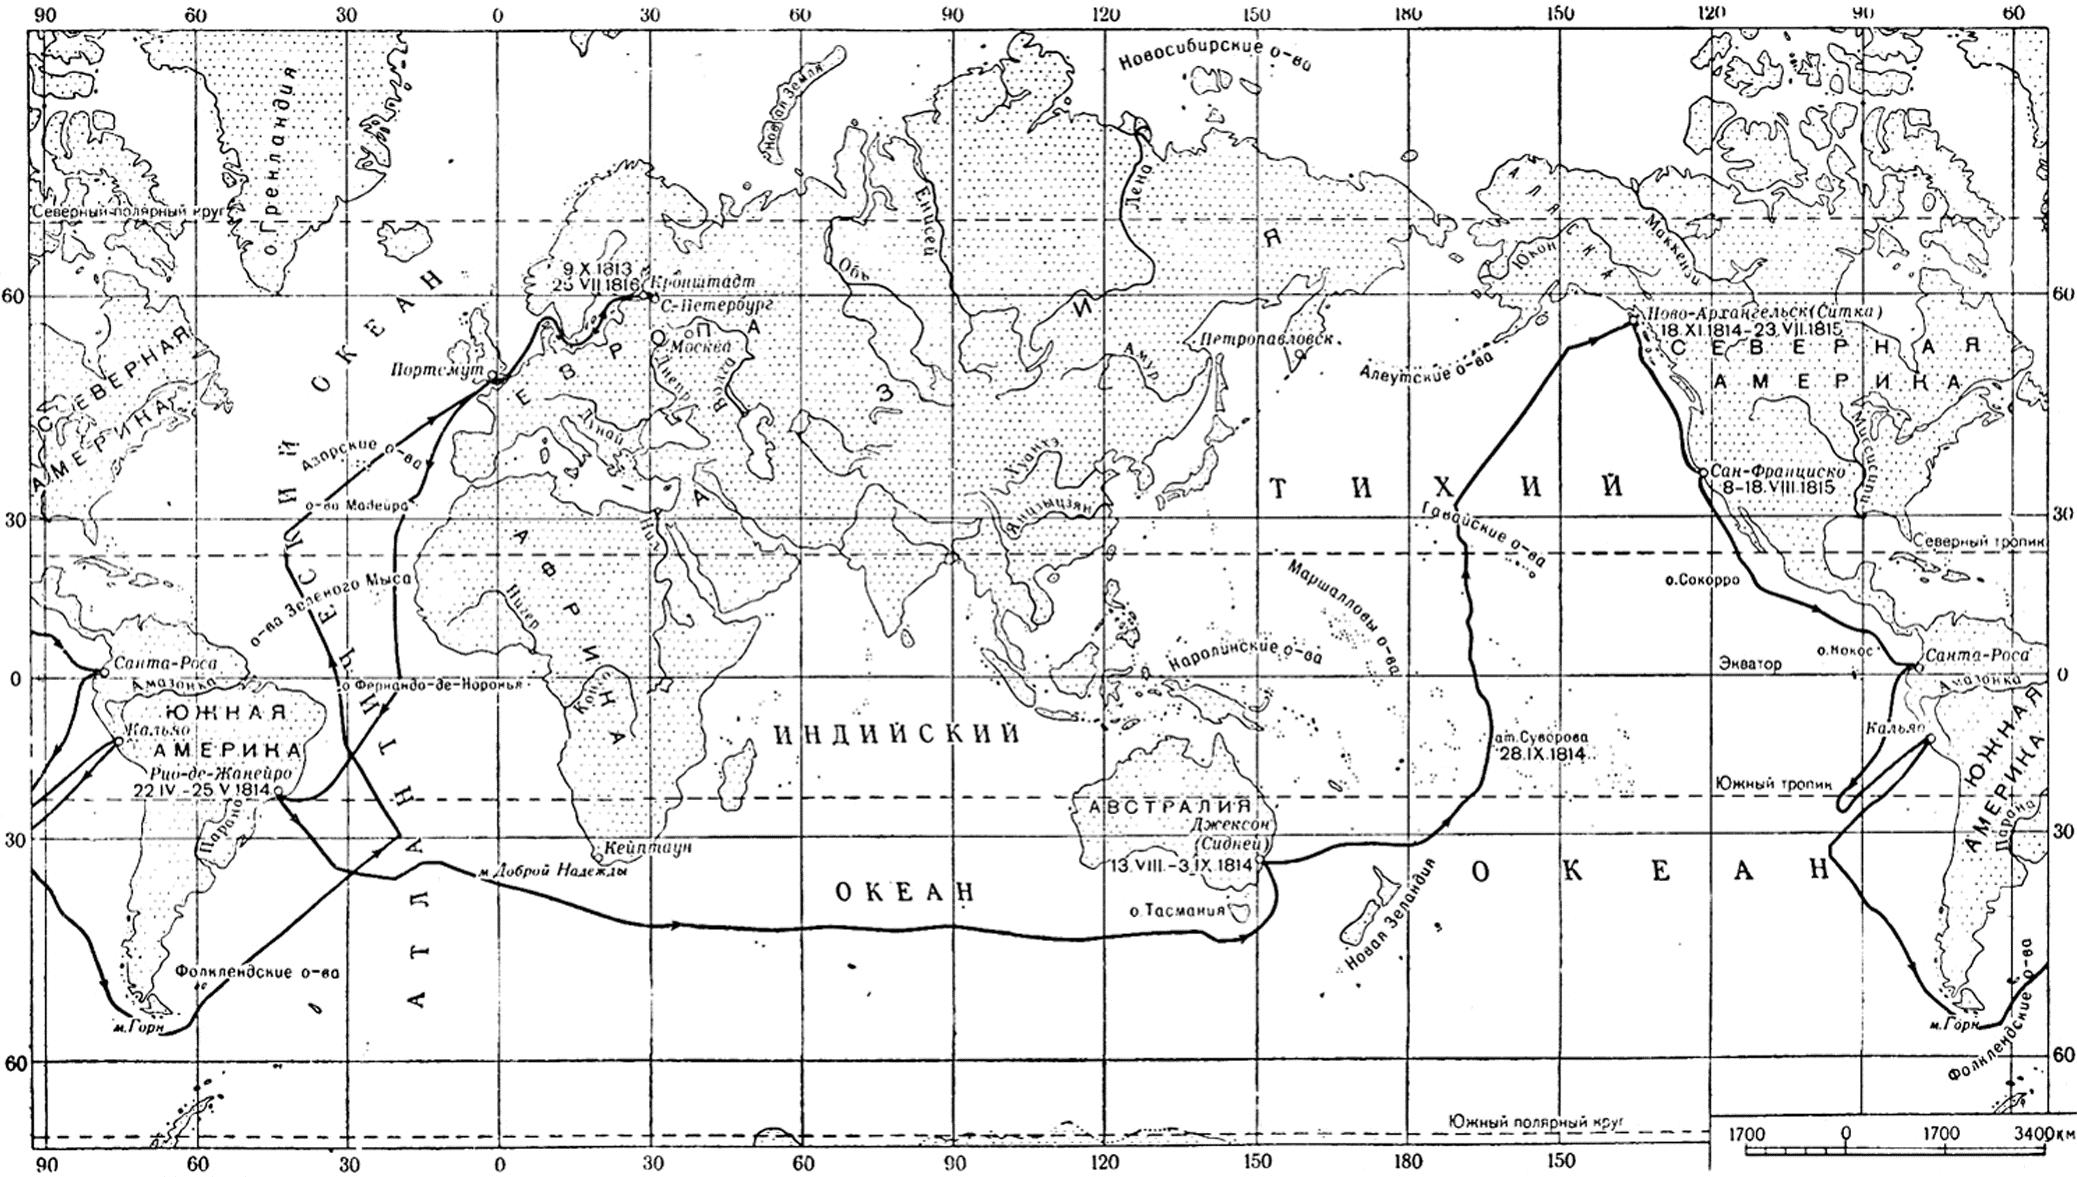 Хождение за три океана